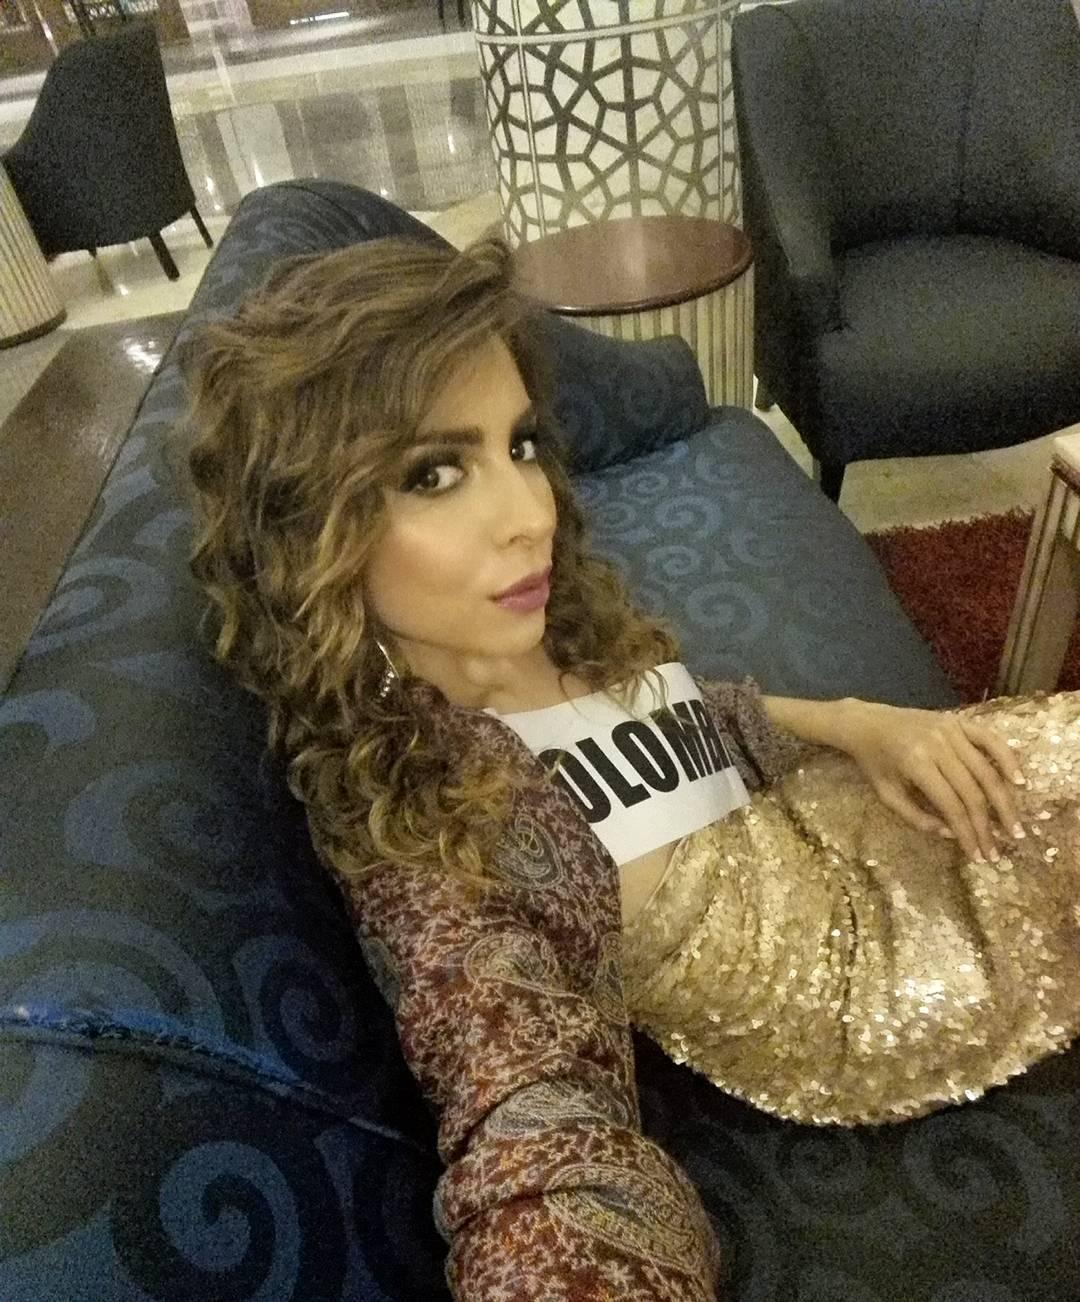 brenda arzuza, miss eco colombia 2017. - Página 3 Otbphxrd